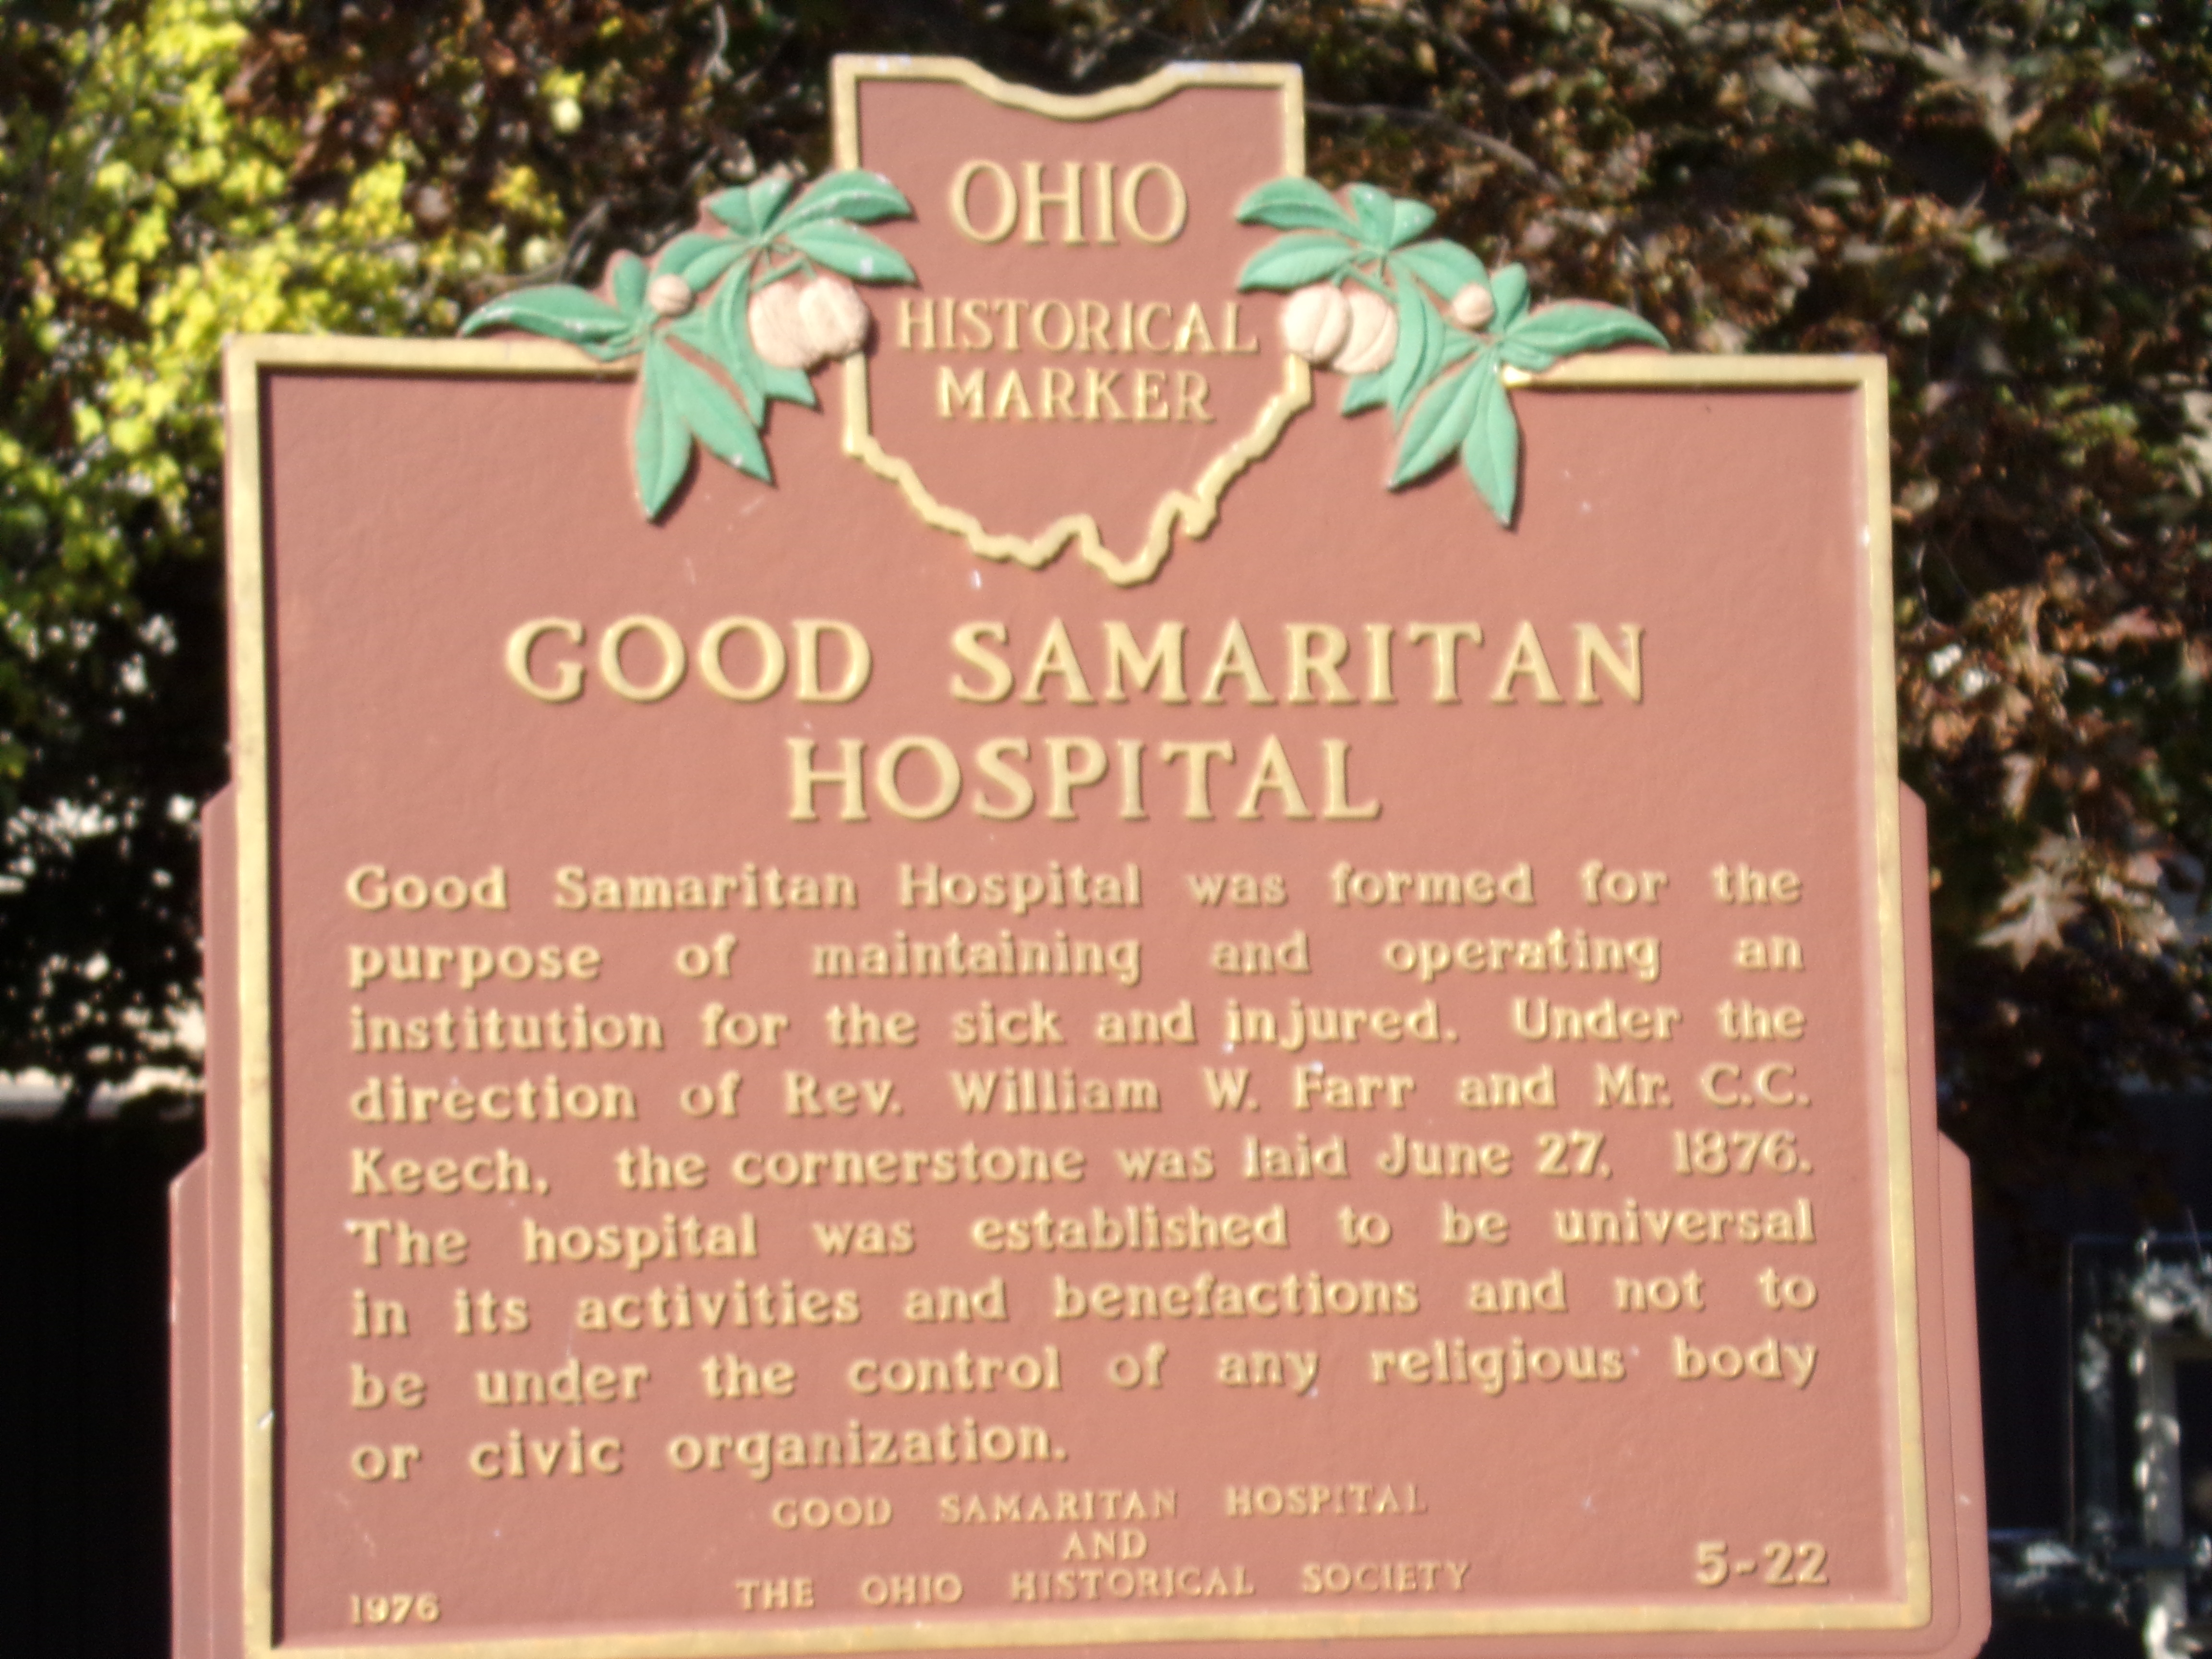 File 101 0477 Good Samaritan Hospital State Hist L Marker Sandusky